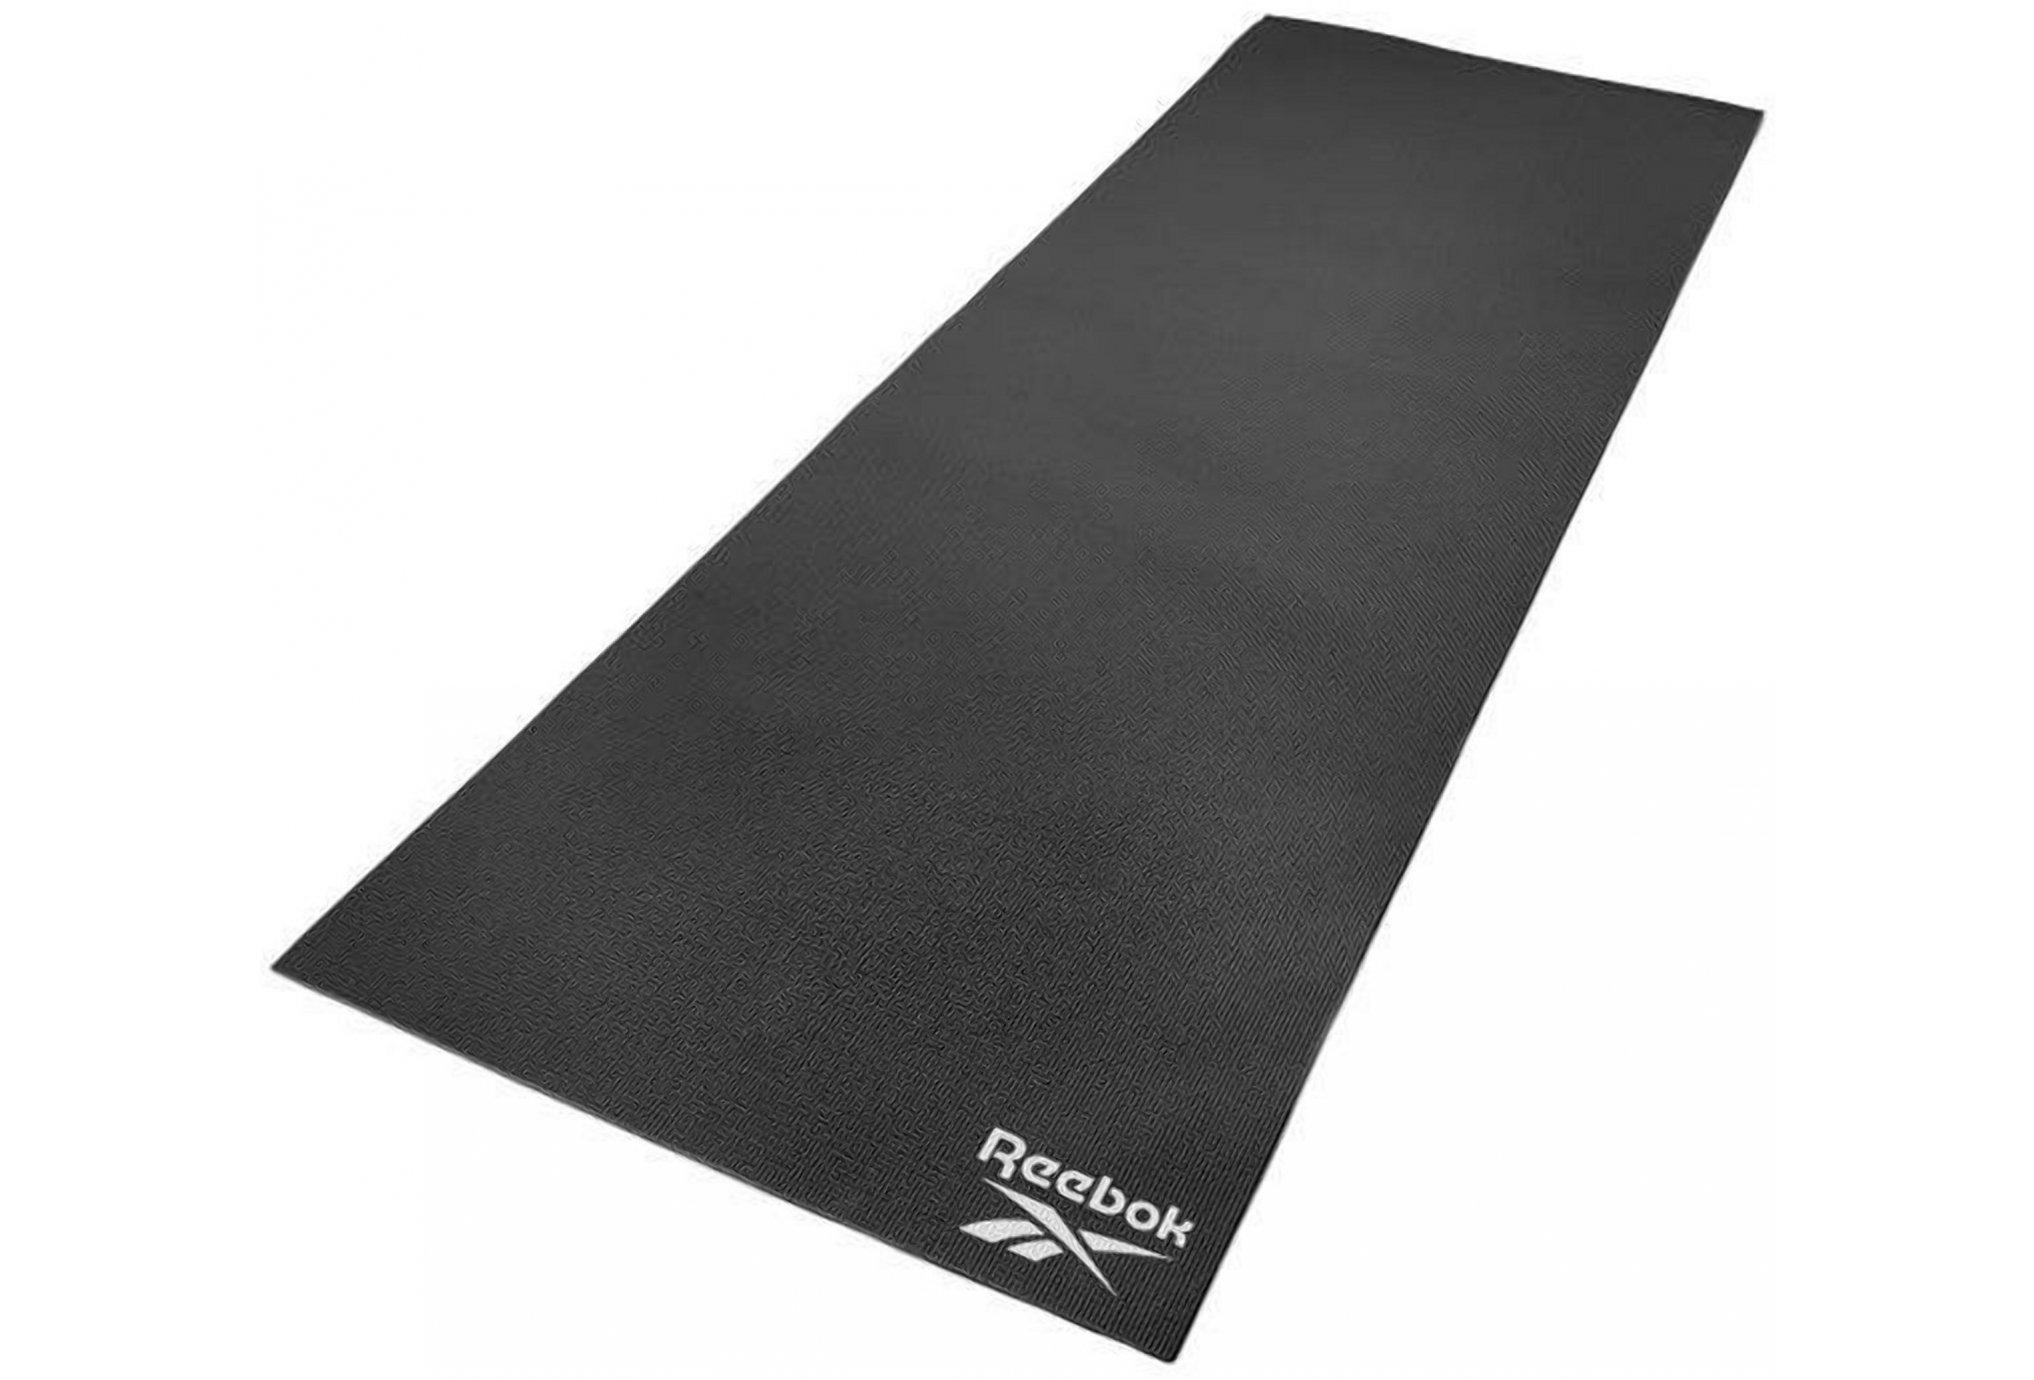 Reebok Yoga Mat - 4 mm Training